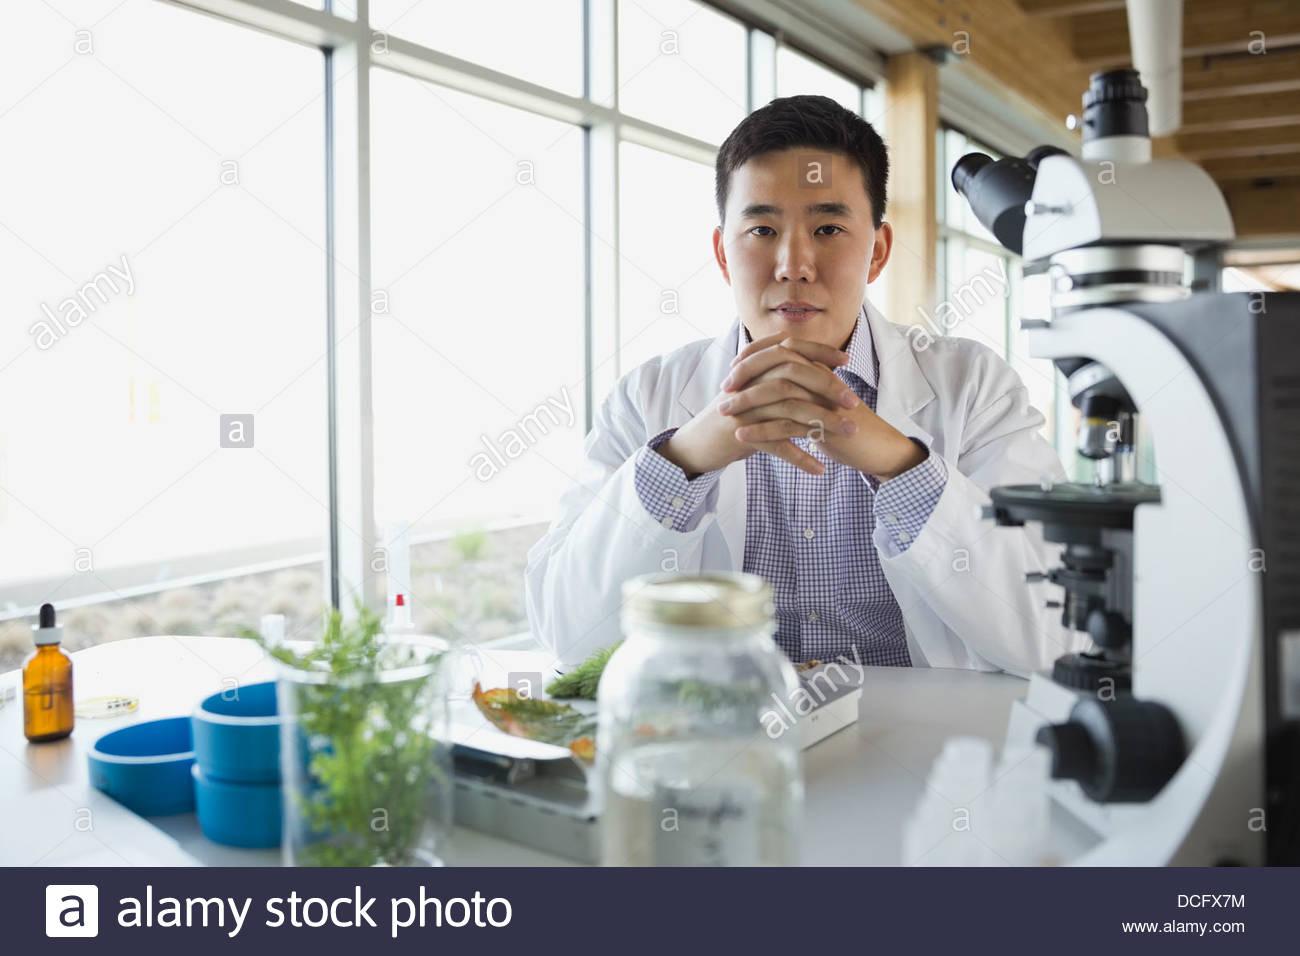 Retrato de botánico sentado en laboratorio Imagen De Stock